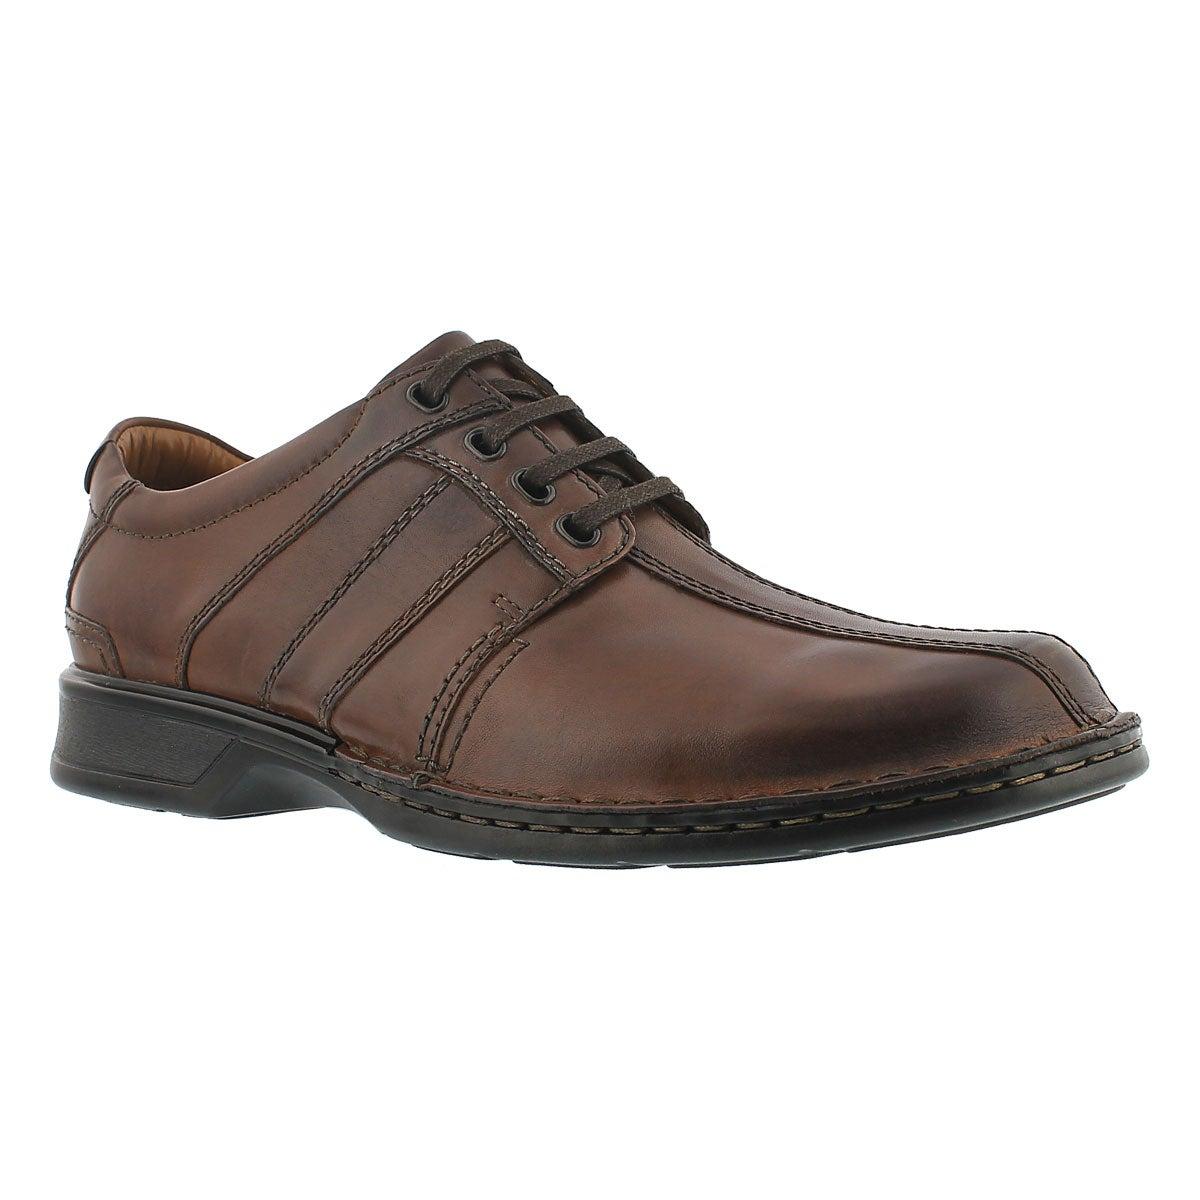 Mns Touareg Vibe brn lace up casual shoe